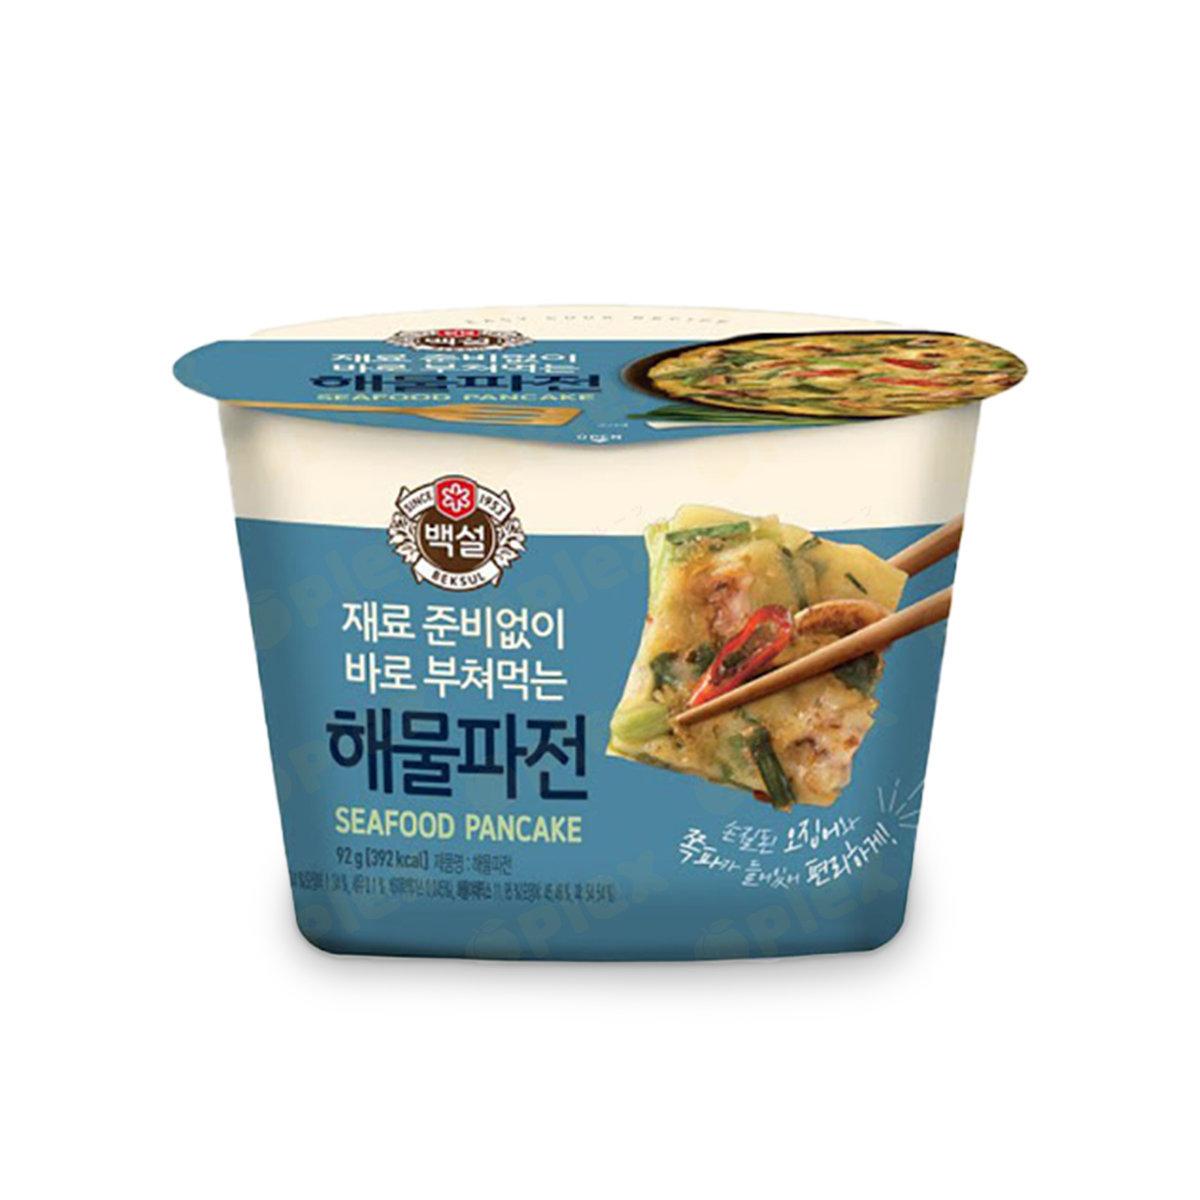 CJ Easy Cook Recipe Korean Pancake - Seafood and Green Onion (92g)